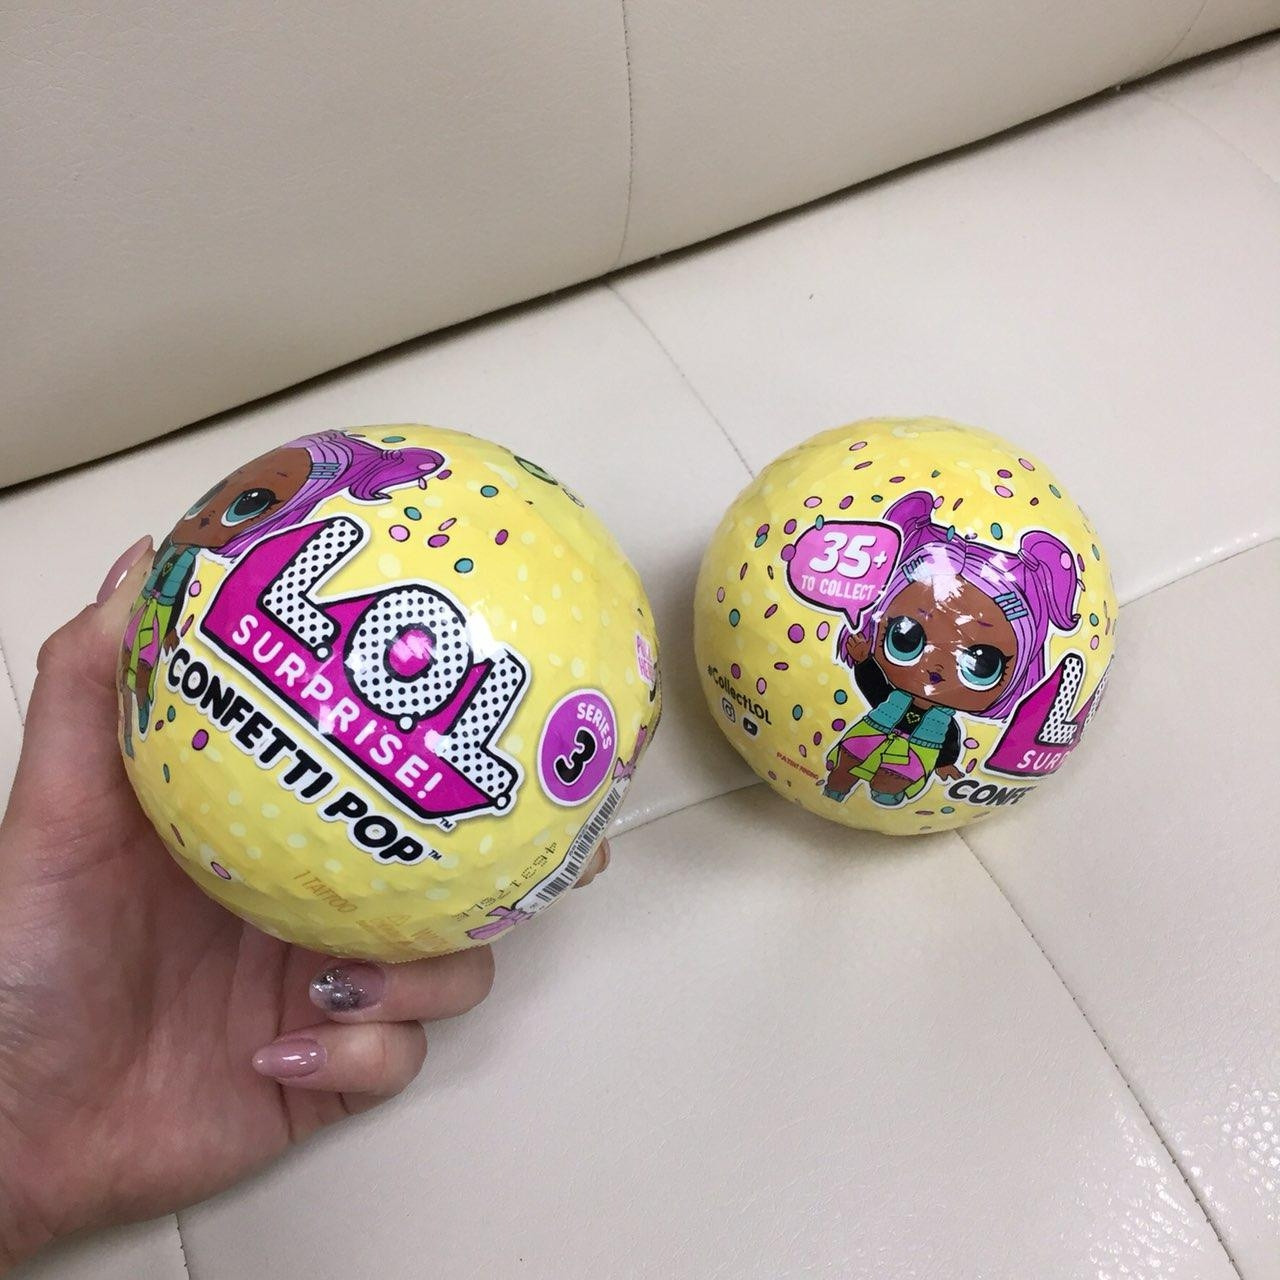 Оригинал Игрушка шар LoL confetti pop surprise 3 серия 35+ кукла лол